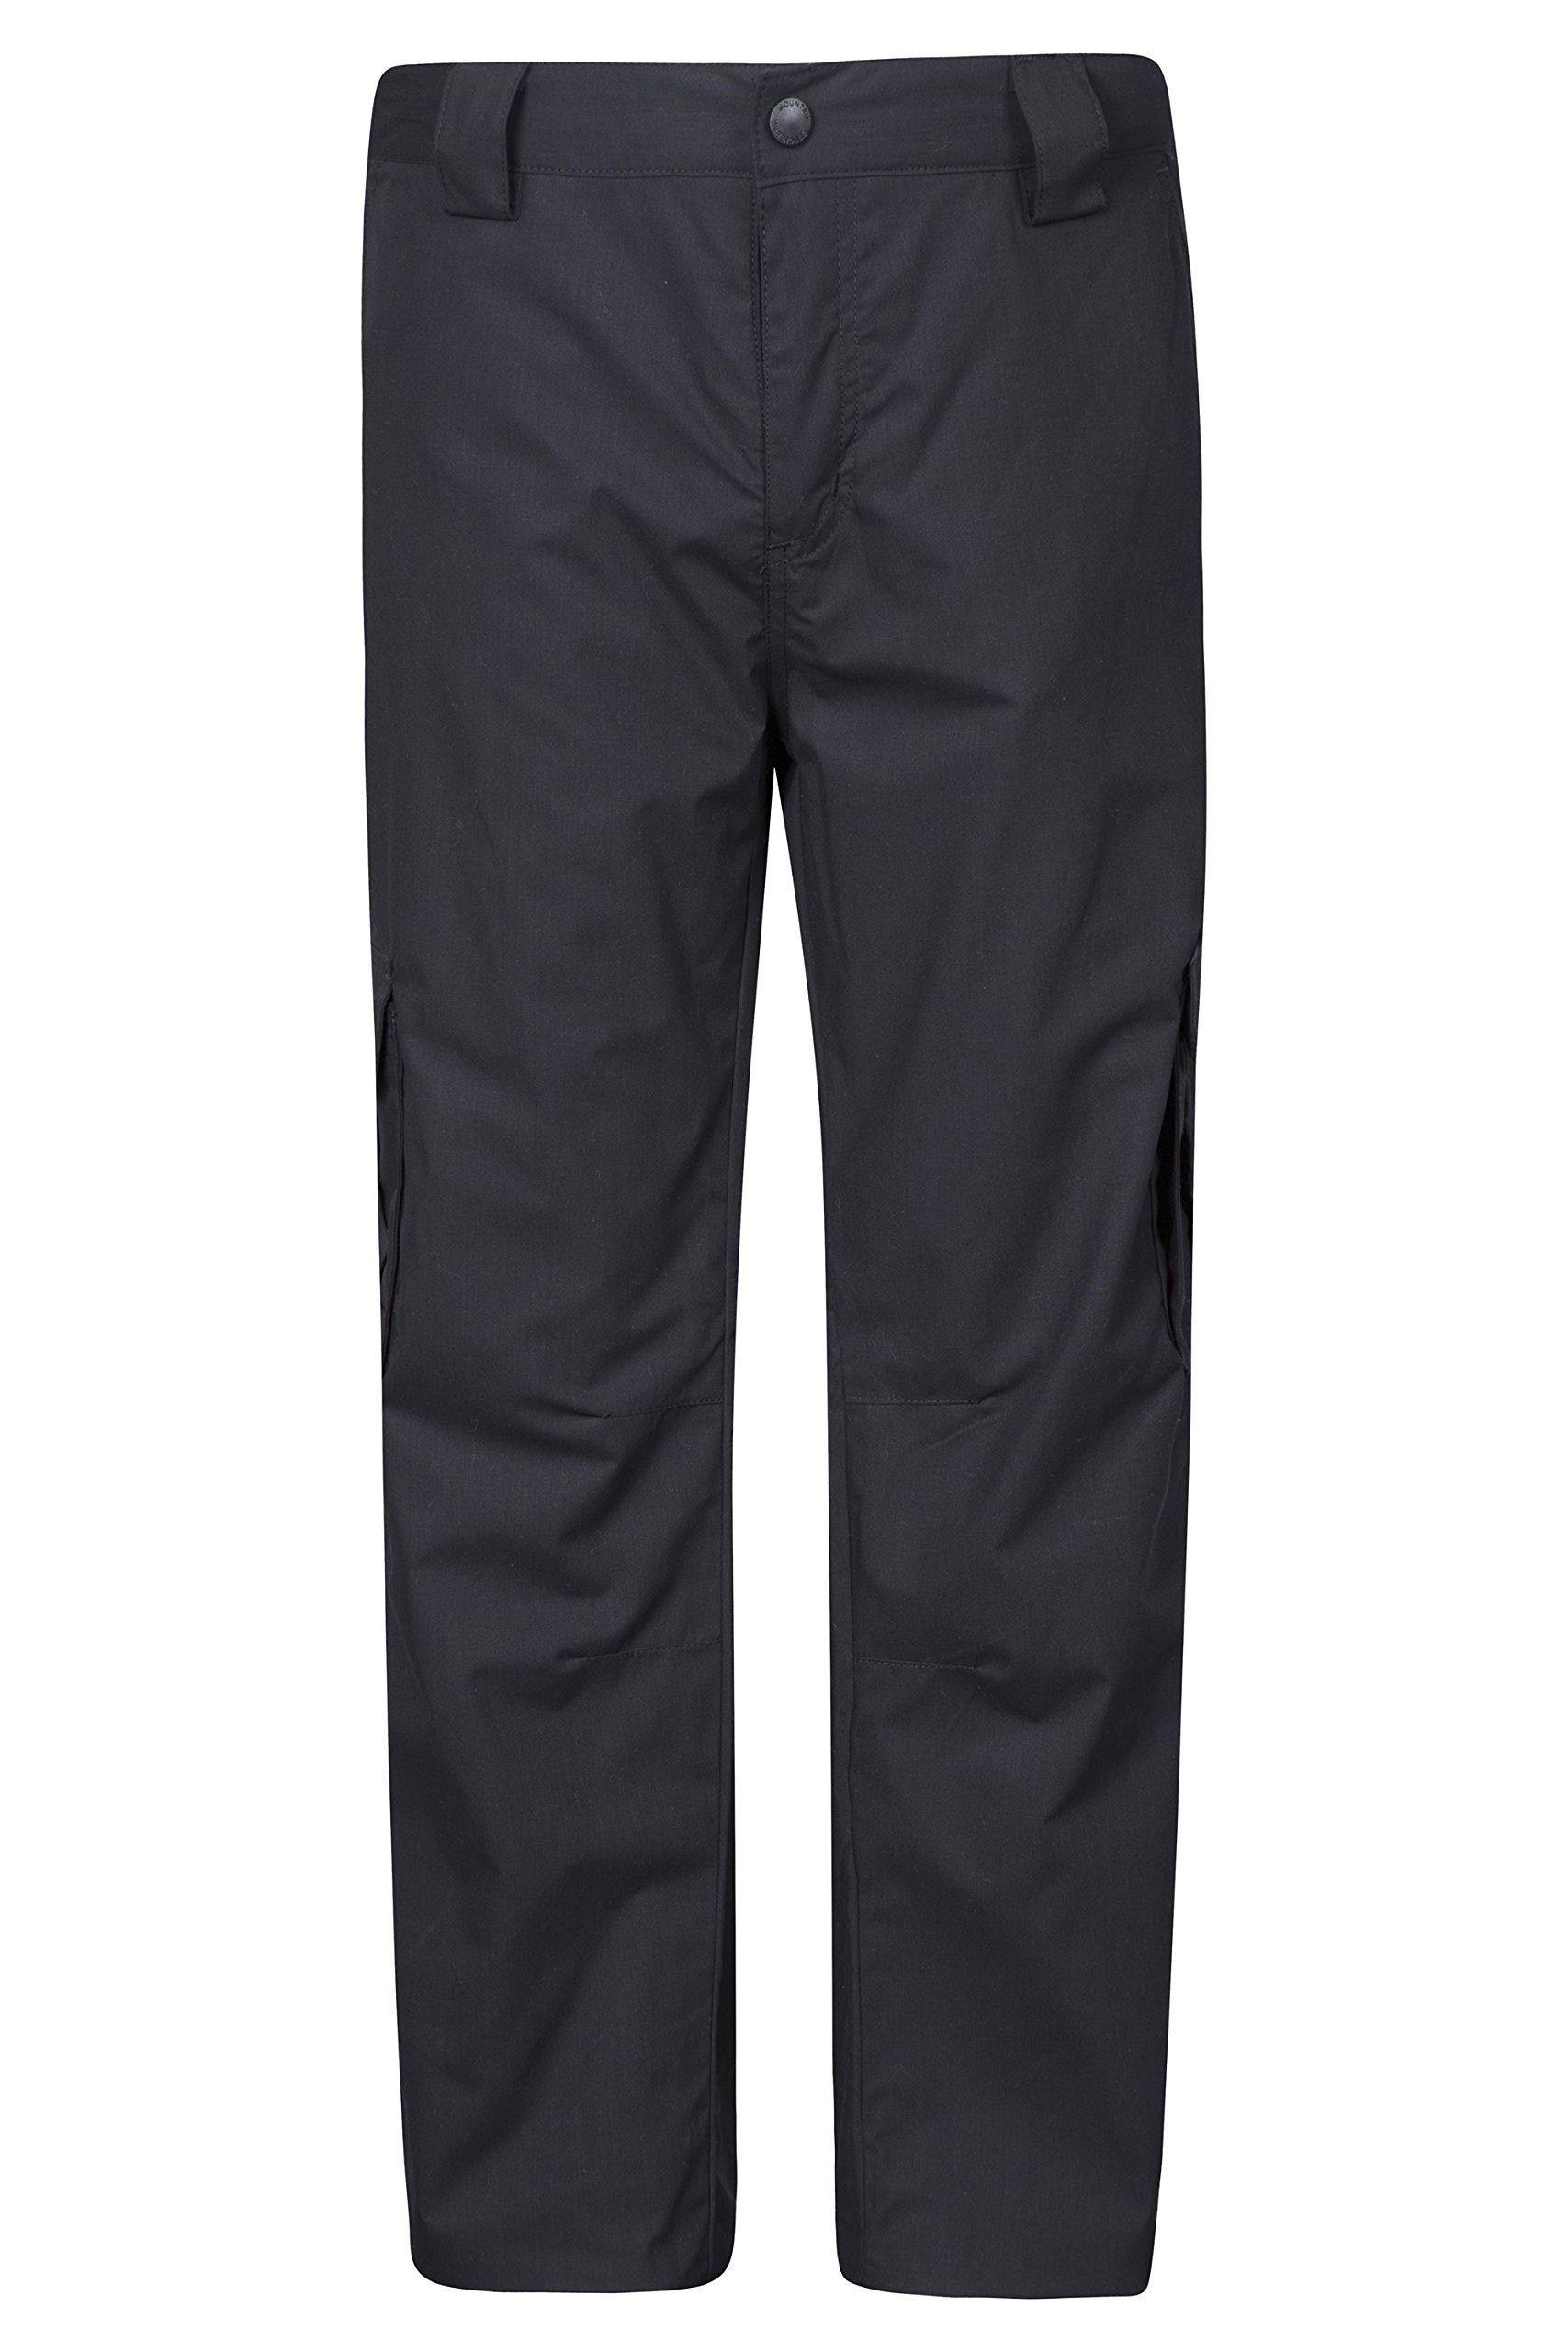 Mountain Warehouse Pantalon Enfant Trek Hiver Chaud